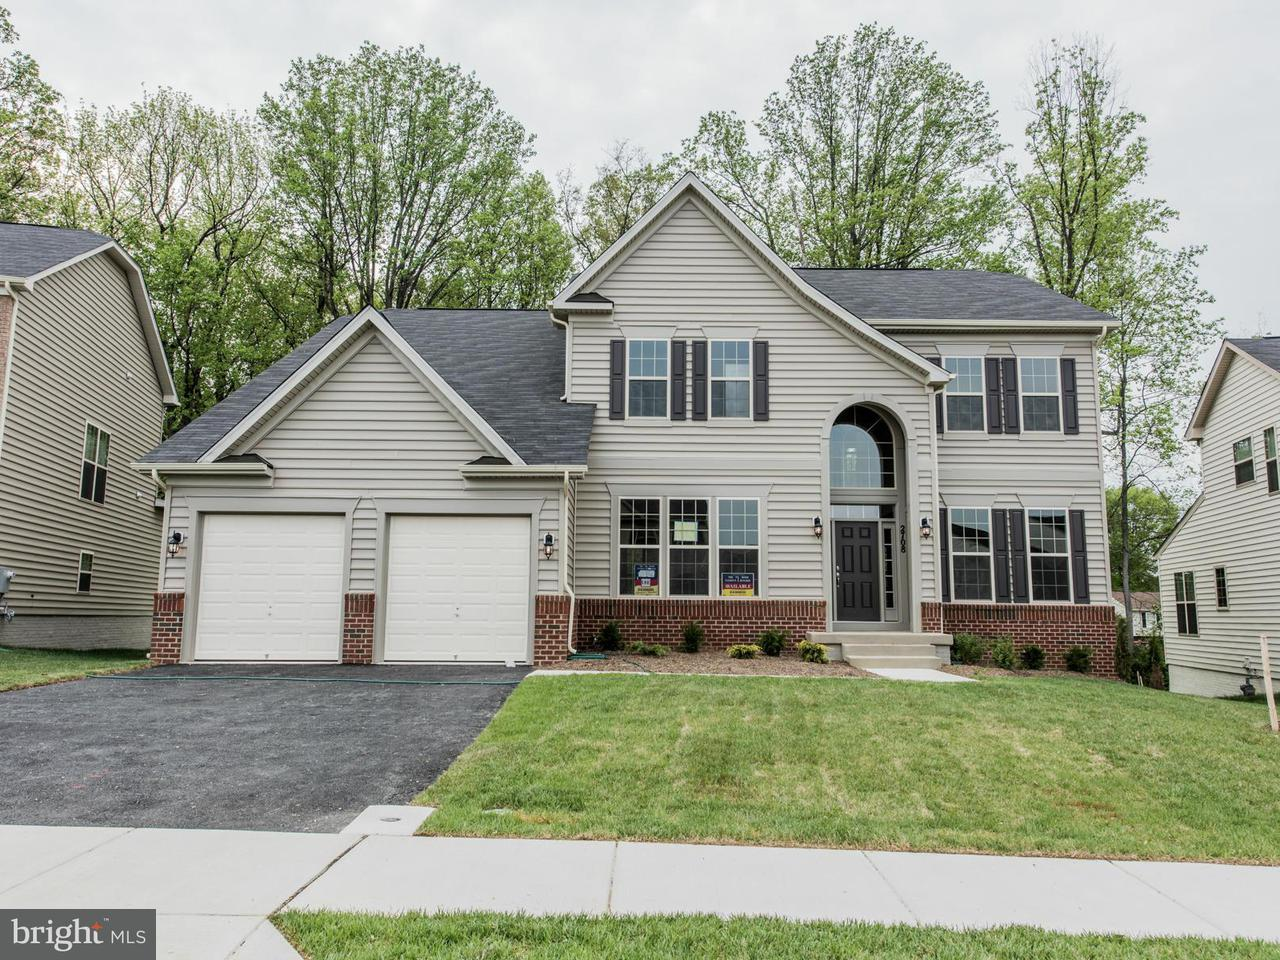 Villa per Vendita alle ore 2408 ST. NICHOLAS WAY 2408 ST. NICHOLAS WAY Glenarden, Maryland 20706 Stati Uniti